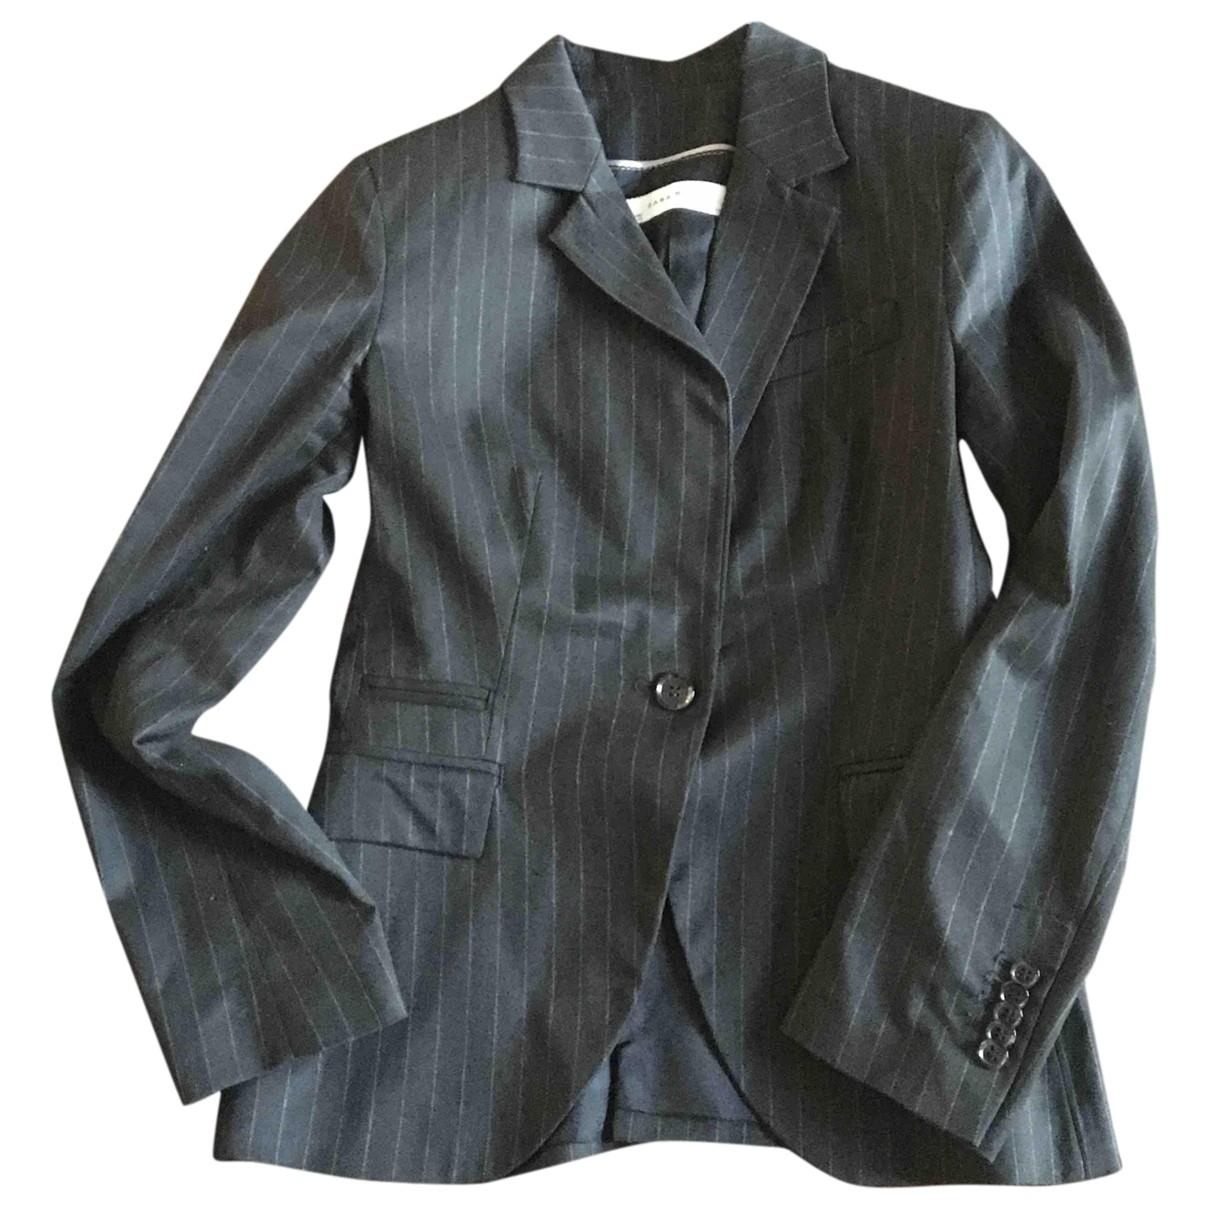 Zara \N Anthracite jacket for Women M International